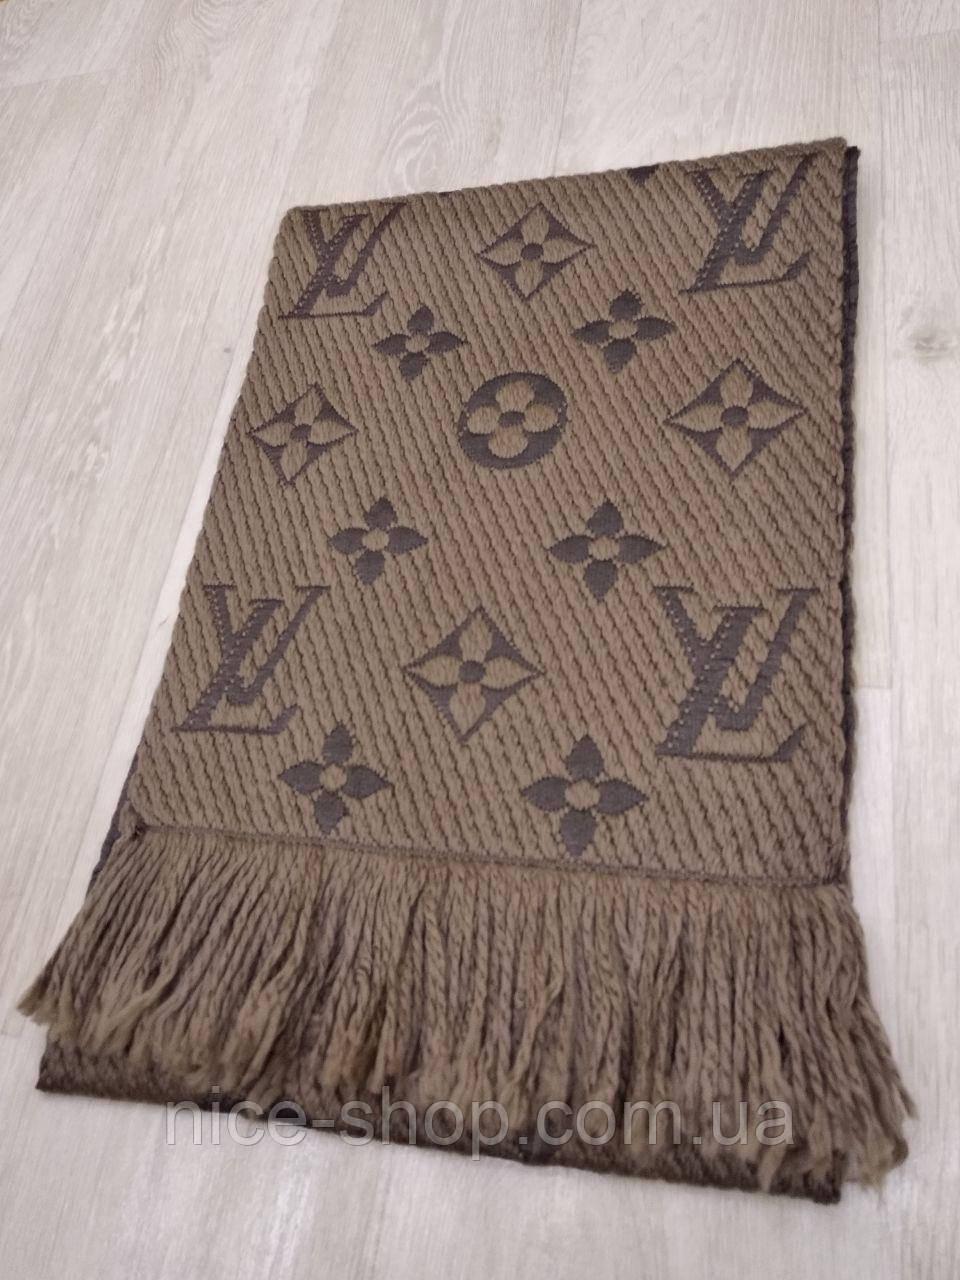 Шарф Louis Vuitton капучино хаки